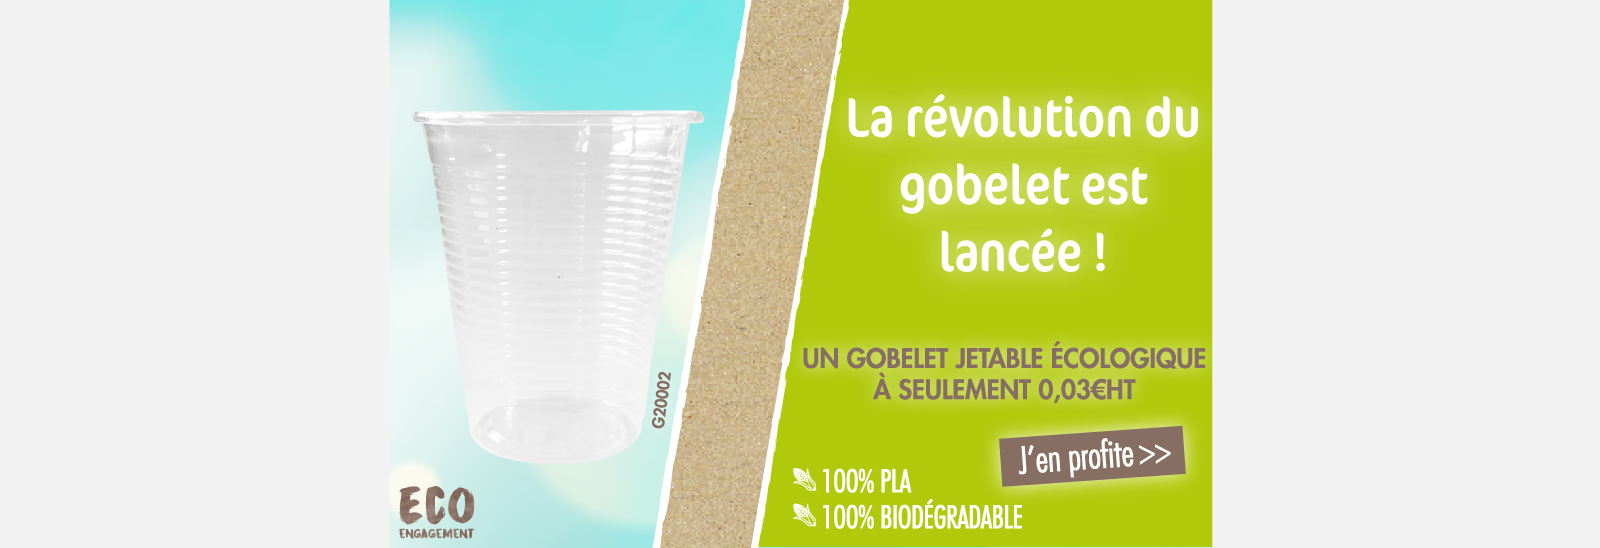 La révolution du gobelet : G20002